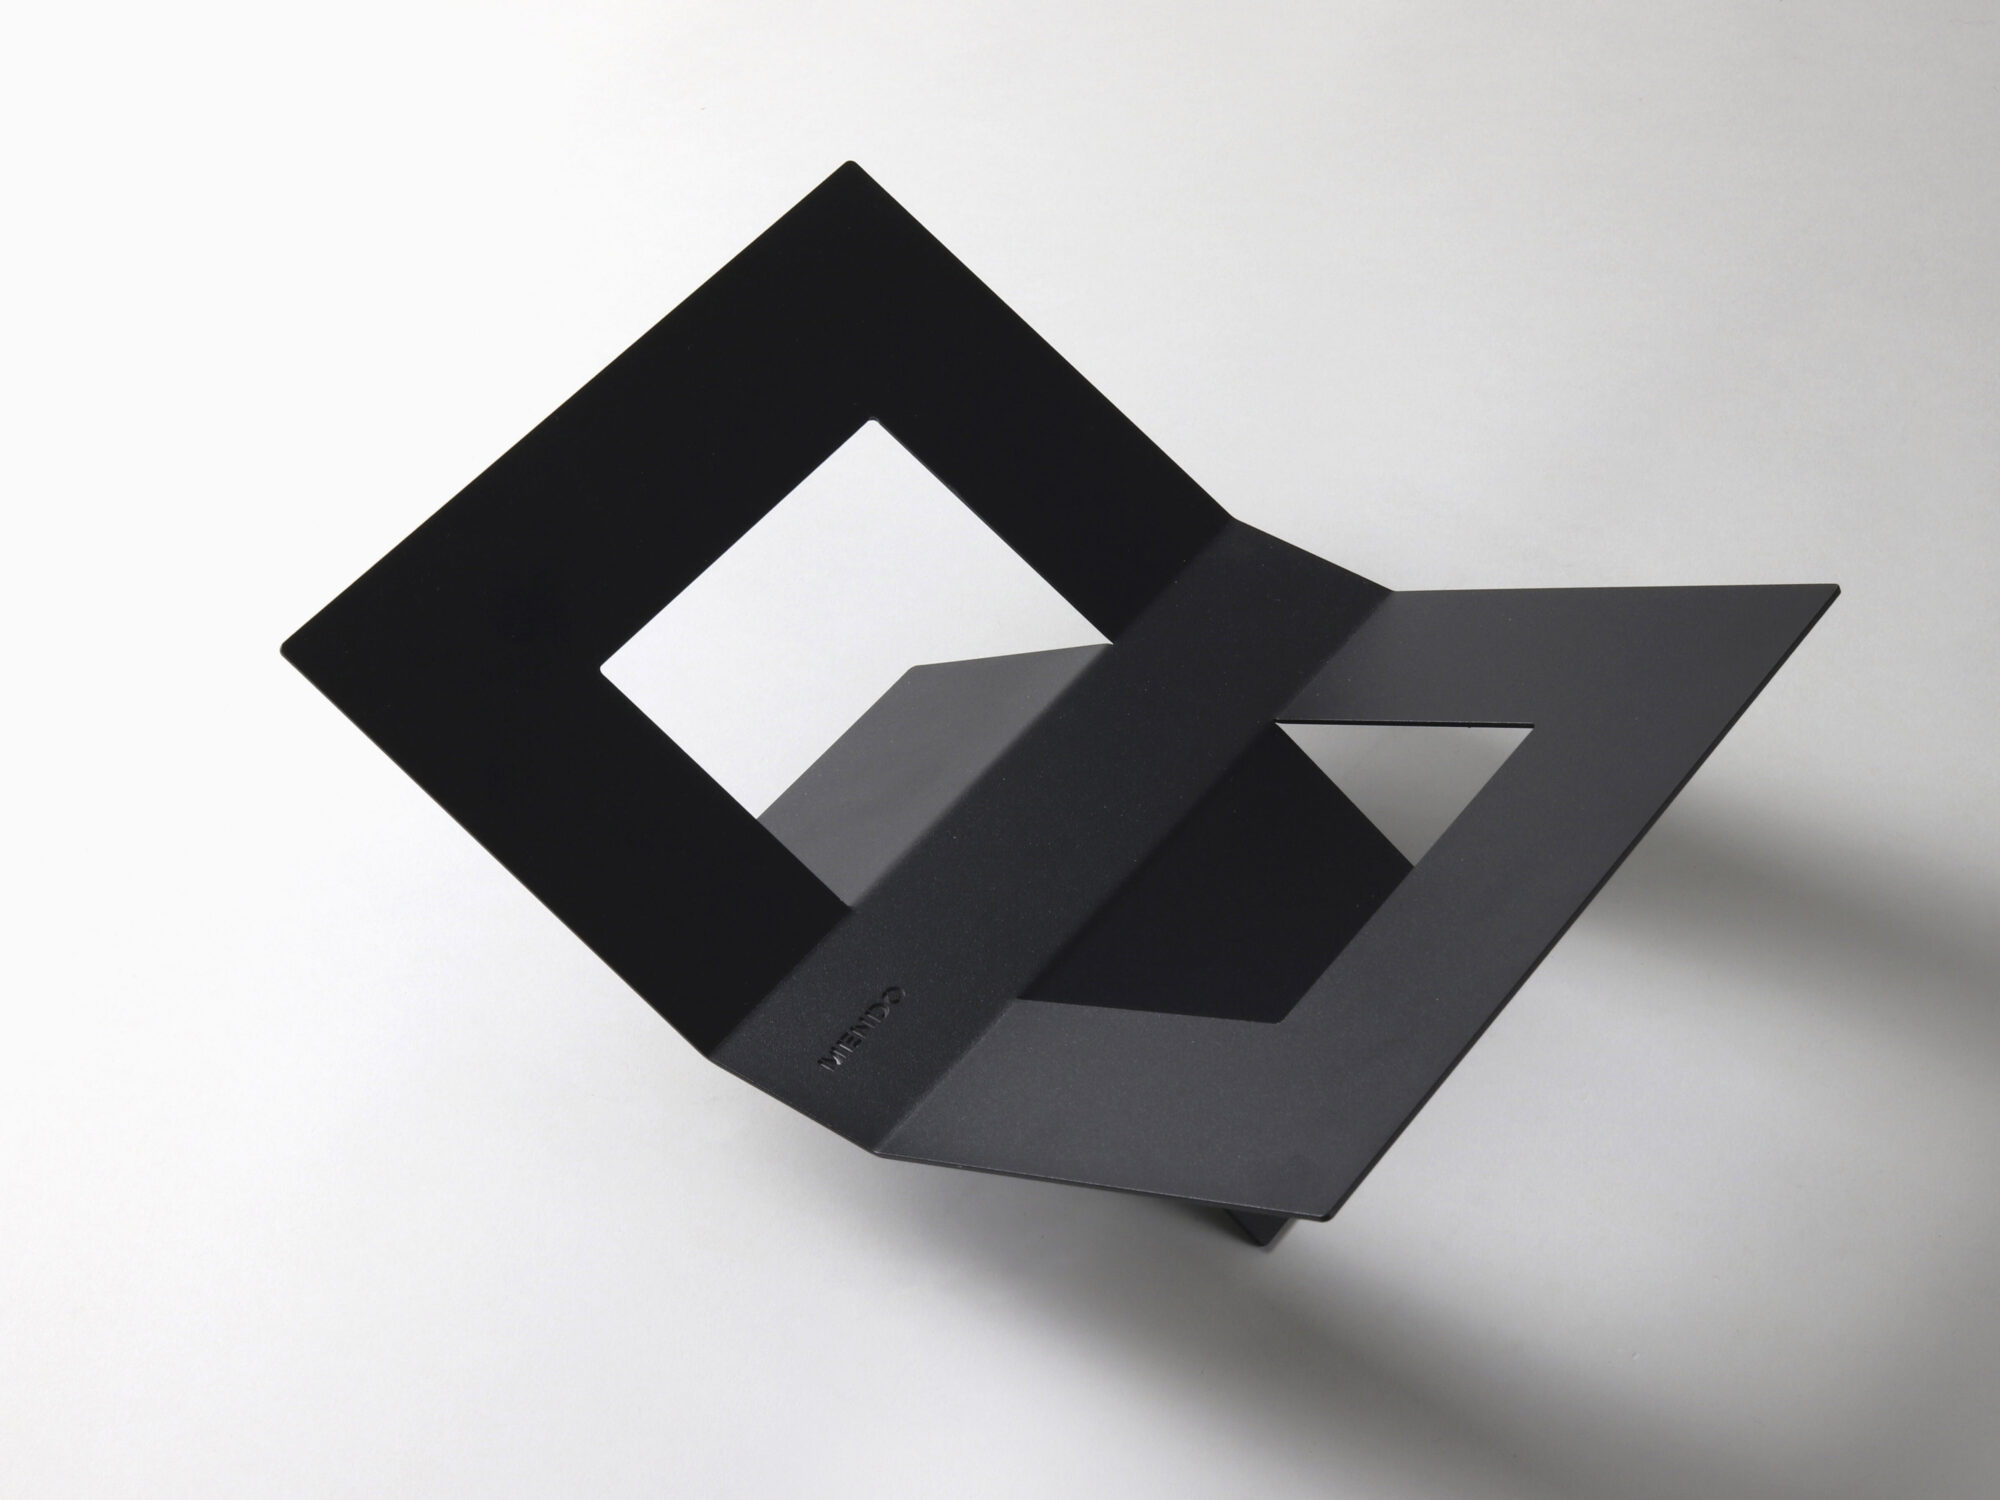 Mendo bookstand in black perspective view.